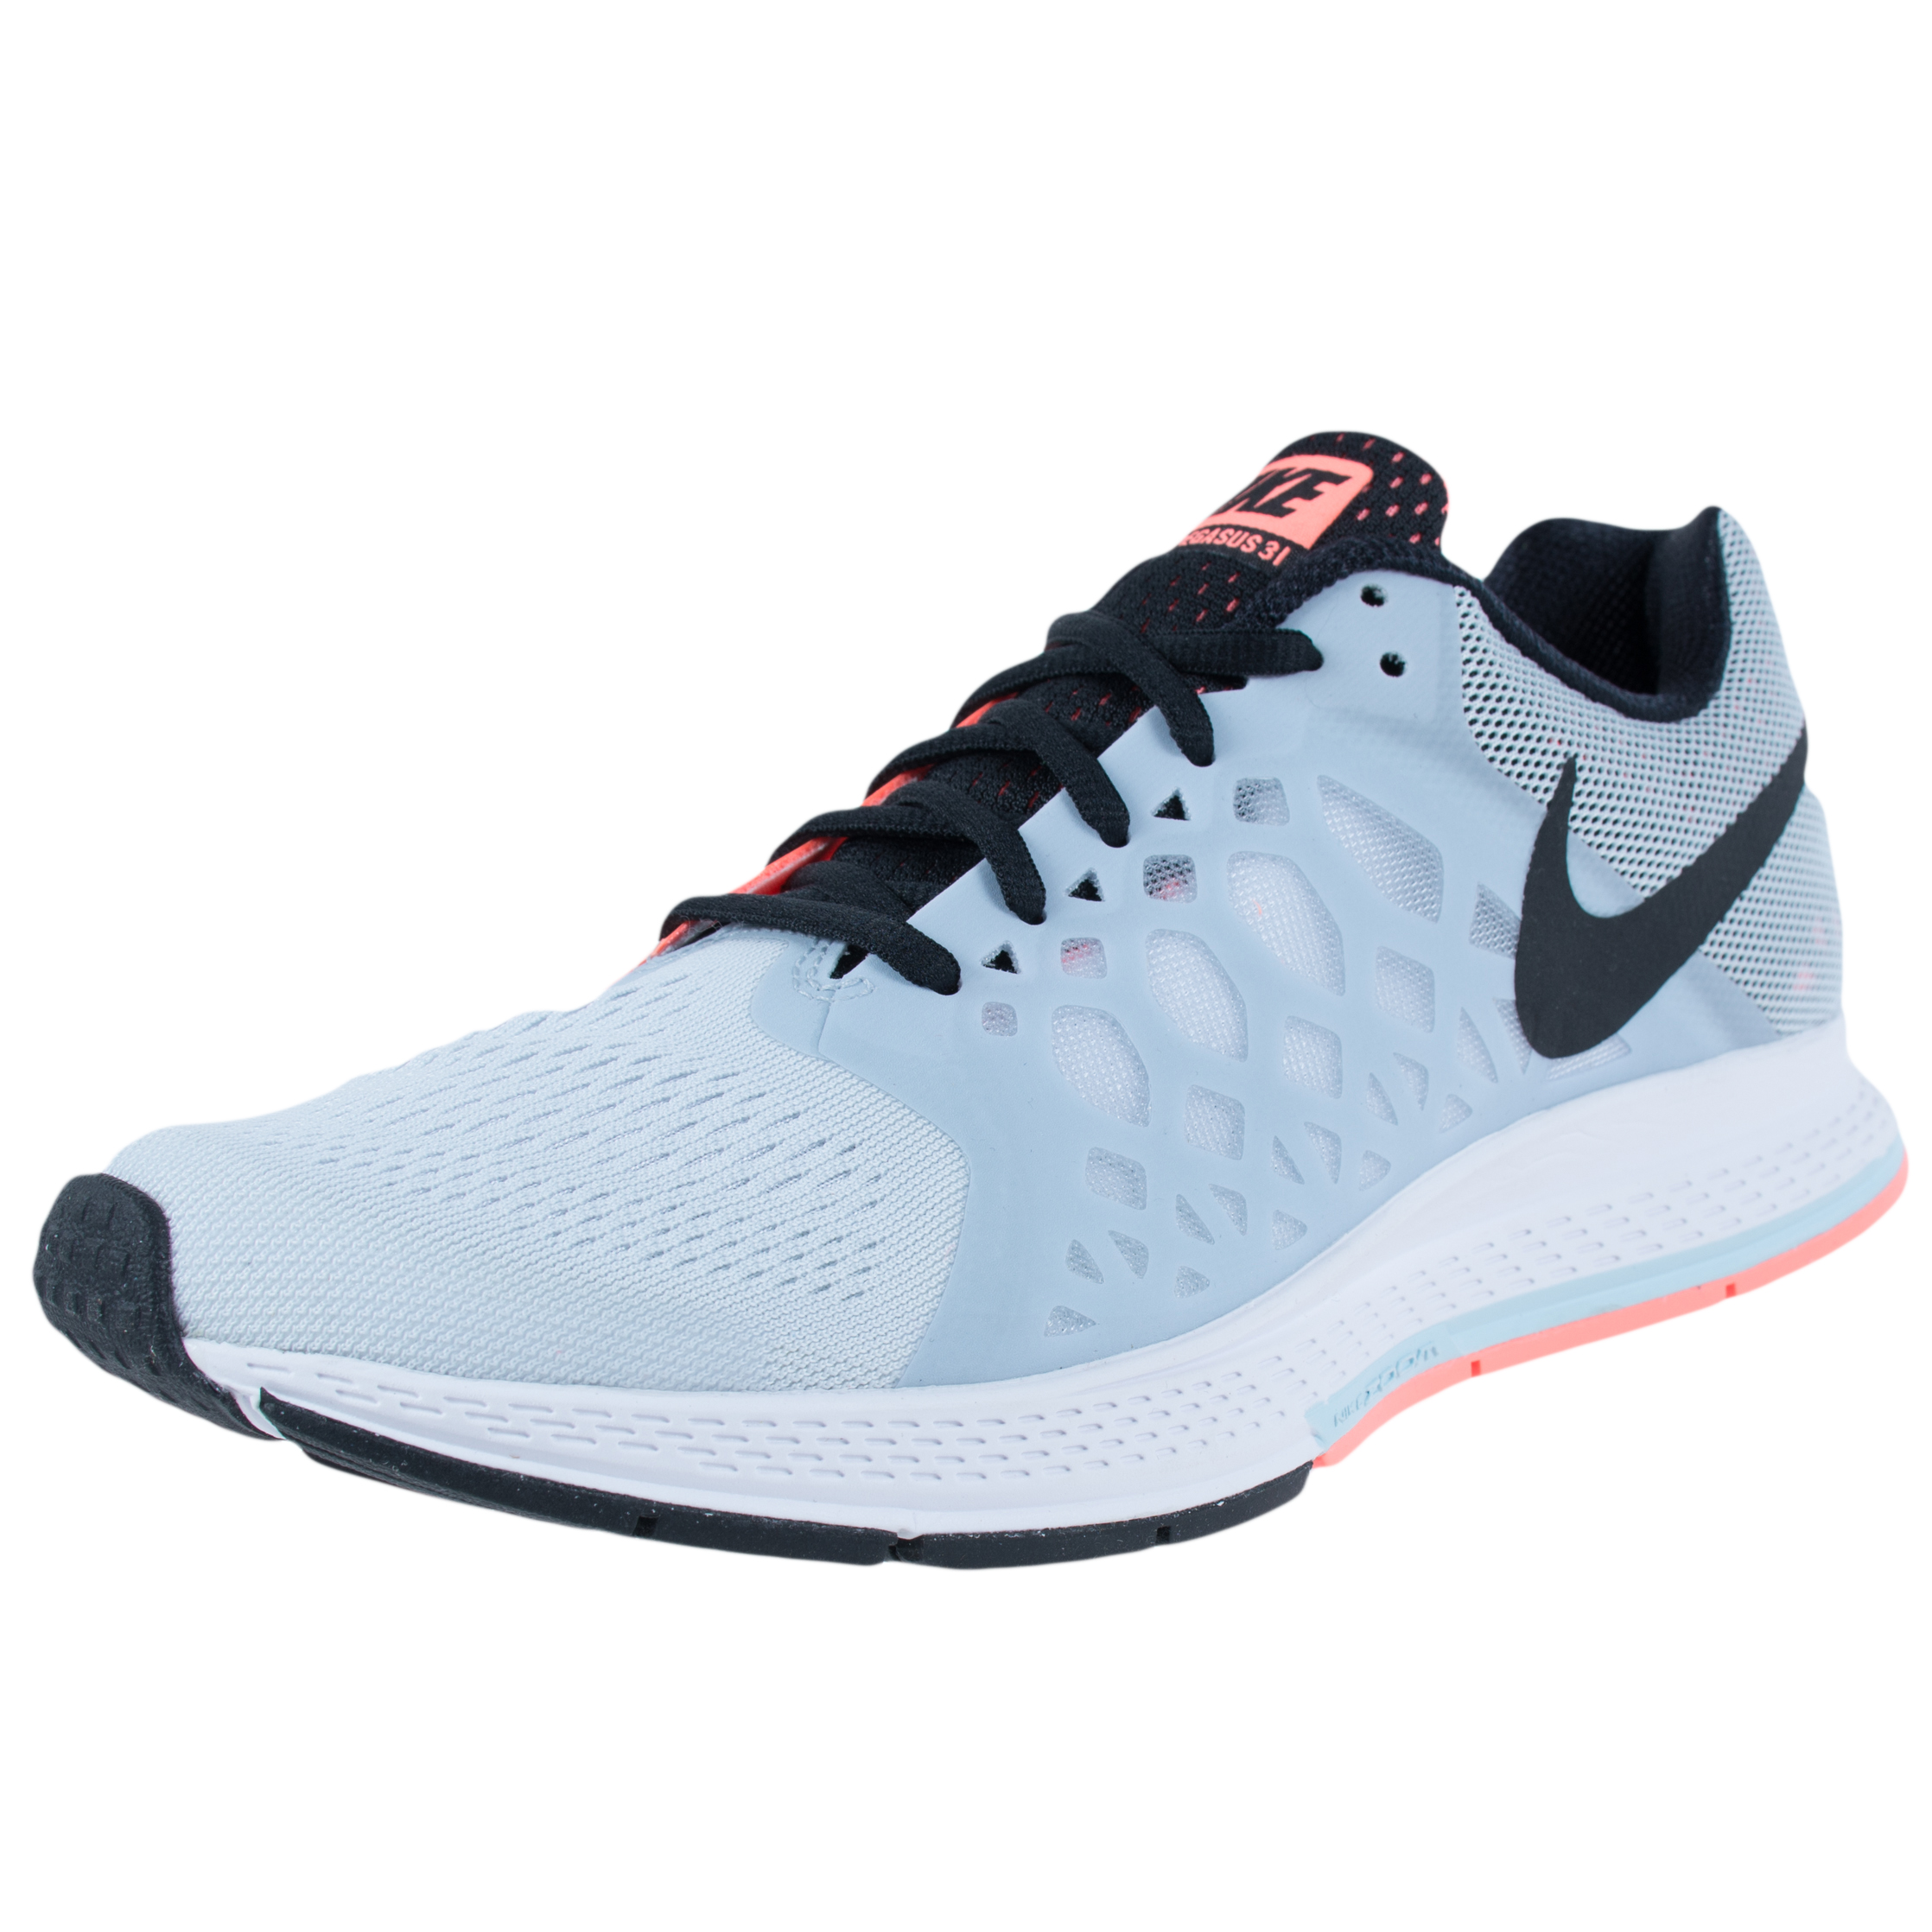 best website 51ca4 e82f4 greece nike wmns air zoom pegasus 31 running shoes platnium white 654486  008 sz 9.5 c9a0d